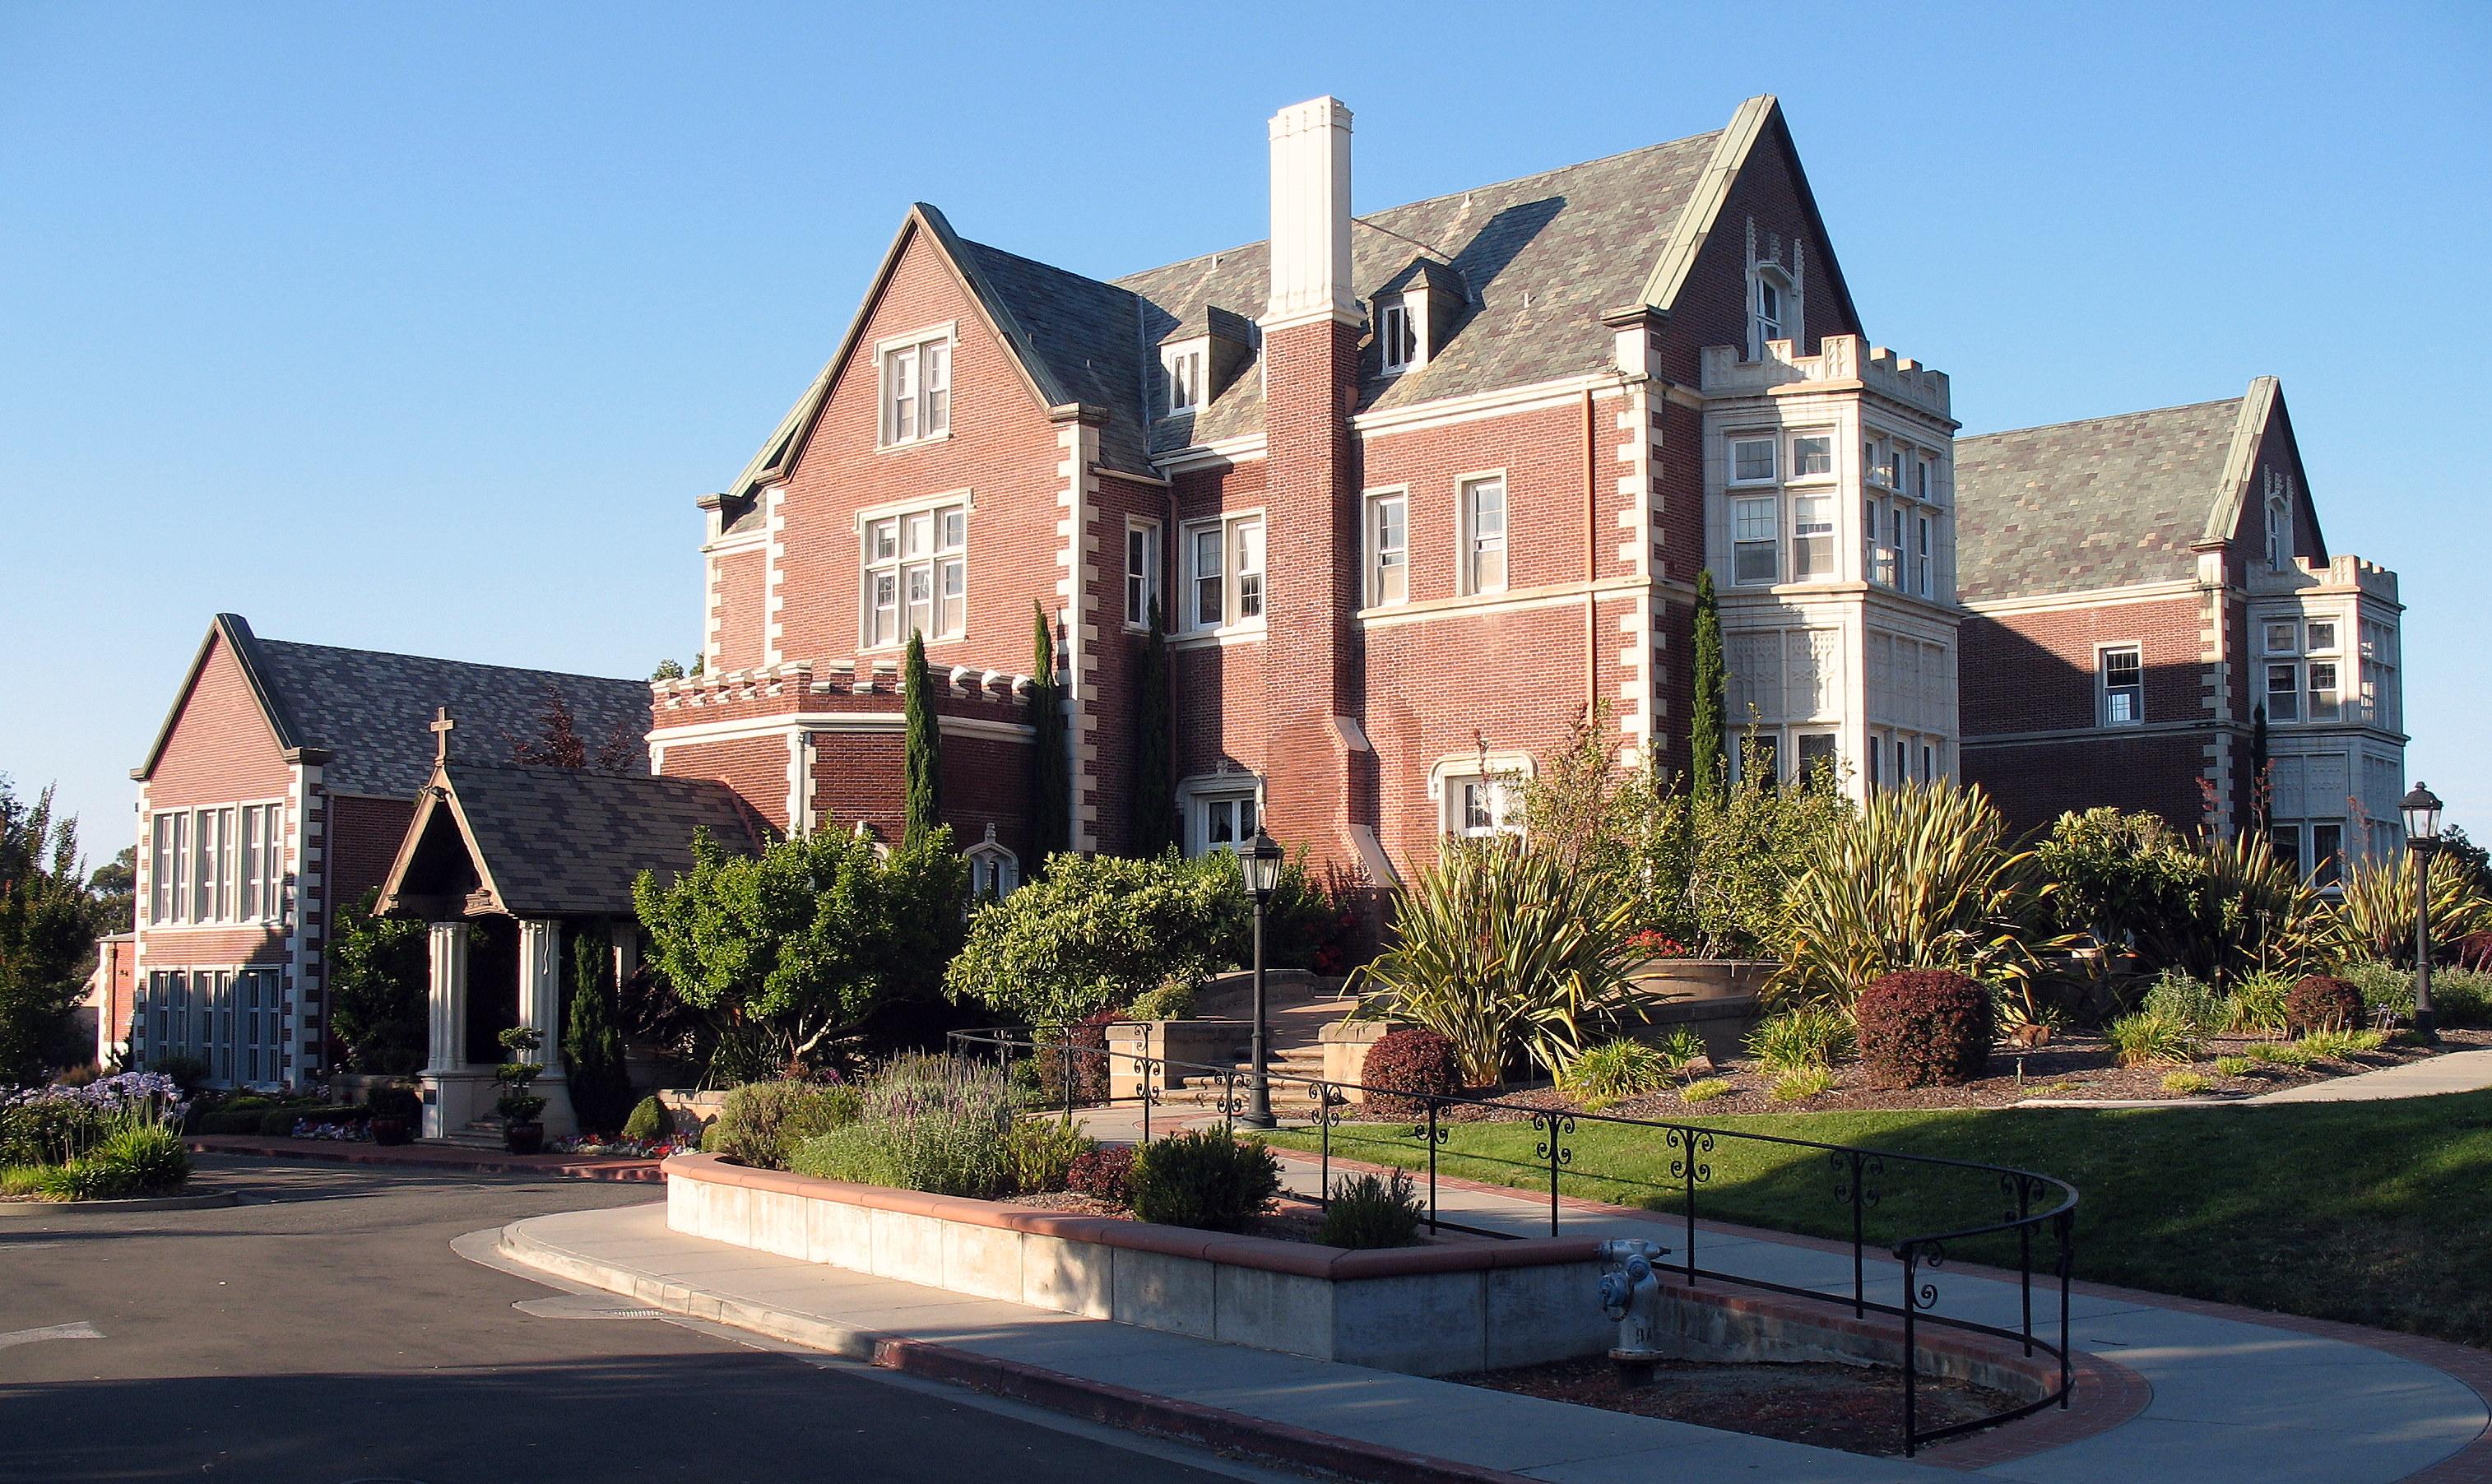 San Mateo Ca >> File:Kohl Mansion, 2750 Adeline Dr., Burlingame, CA 7-31-2011 6-52-34 PM.JPG - Wikimedia Commons